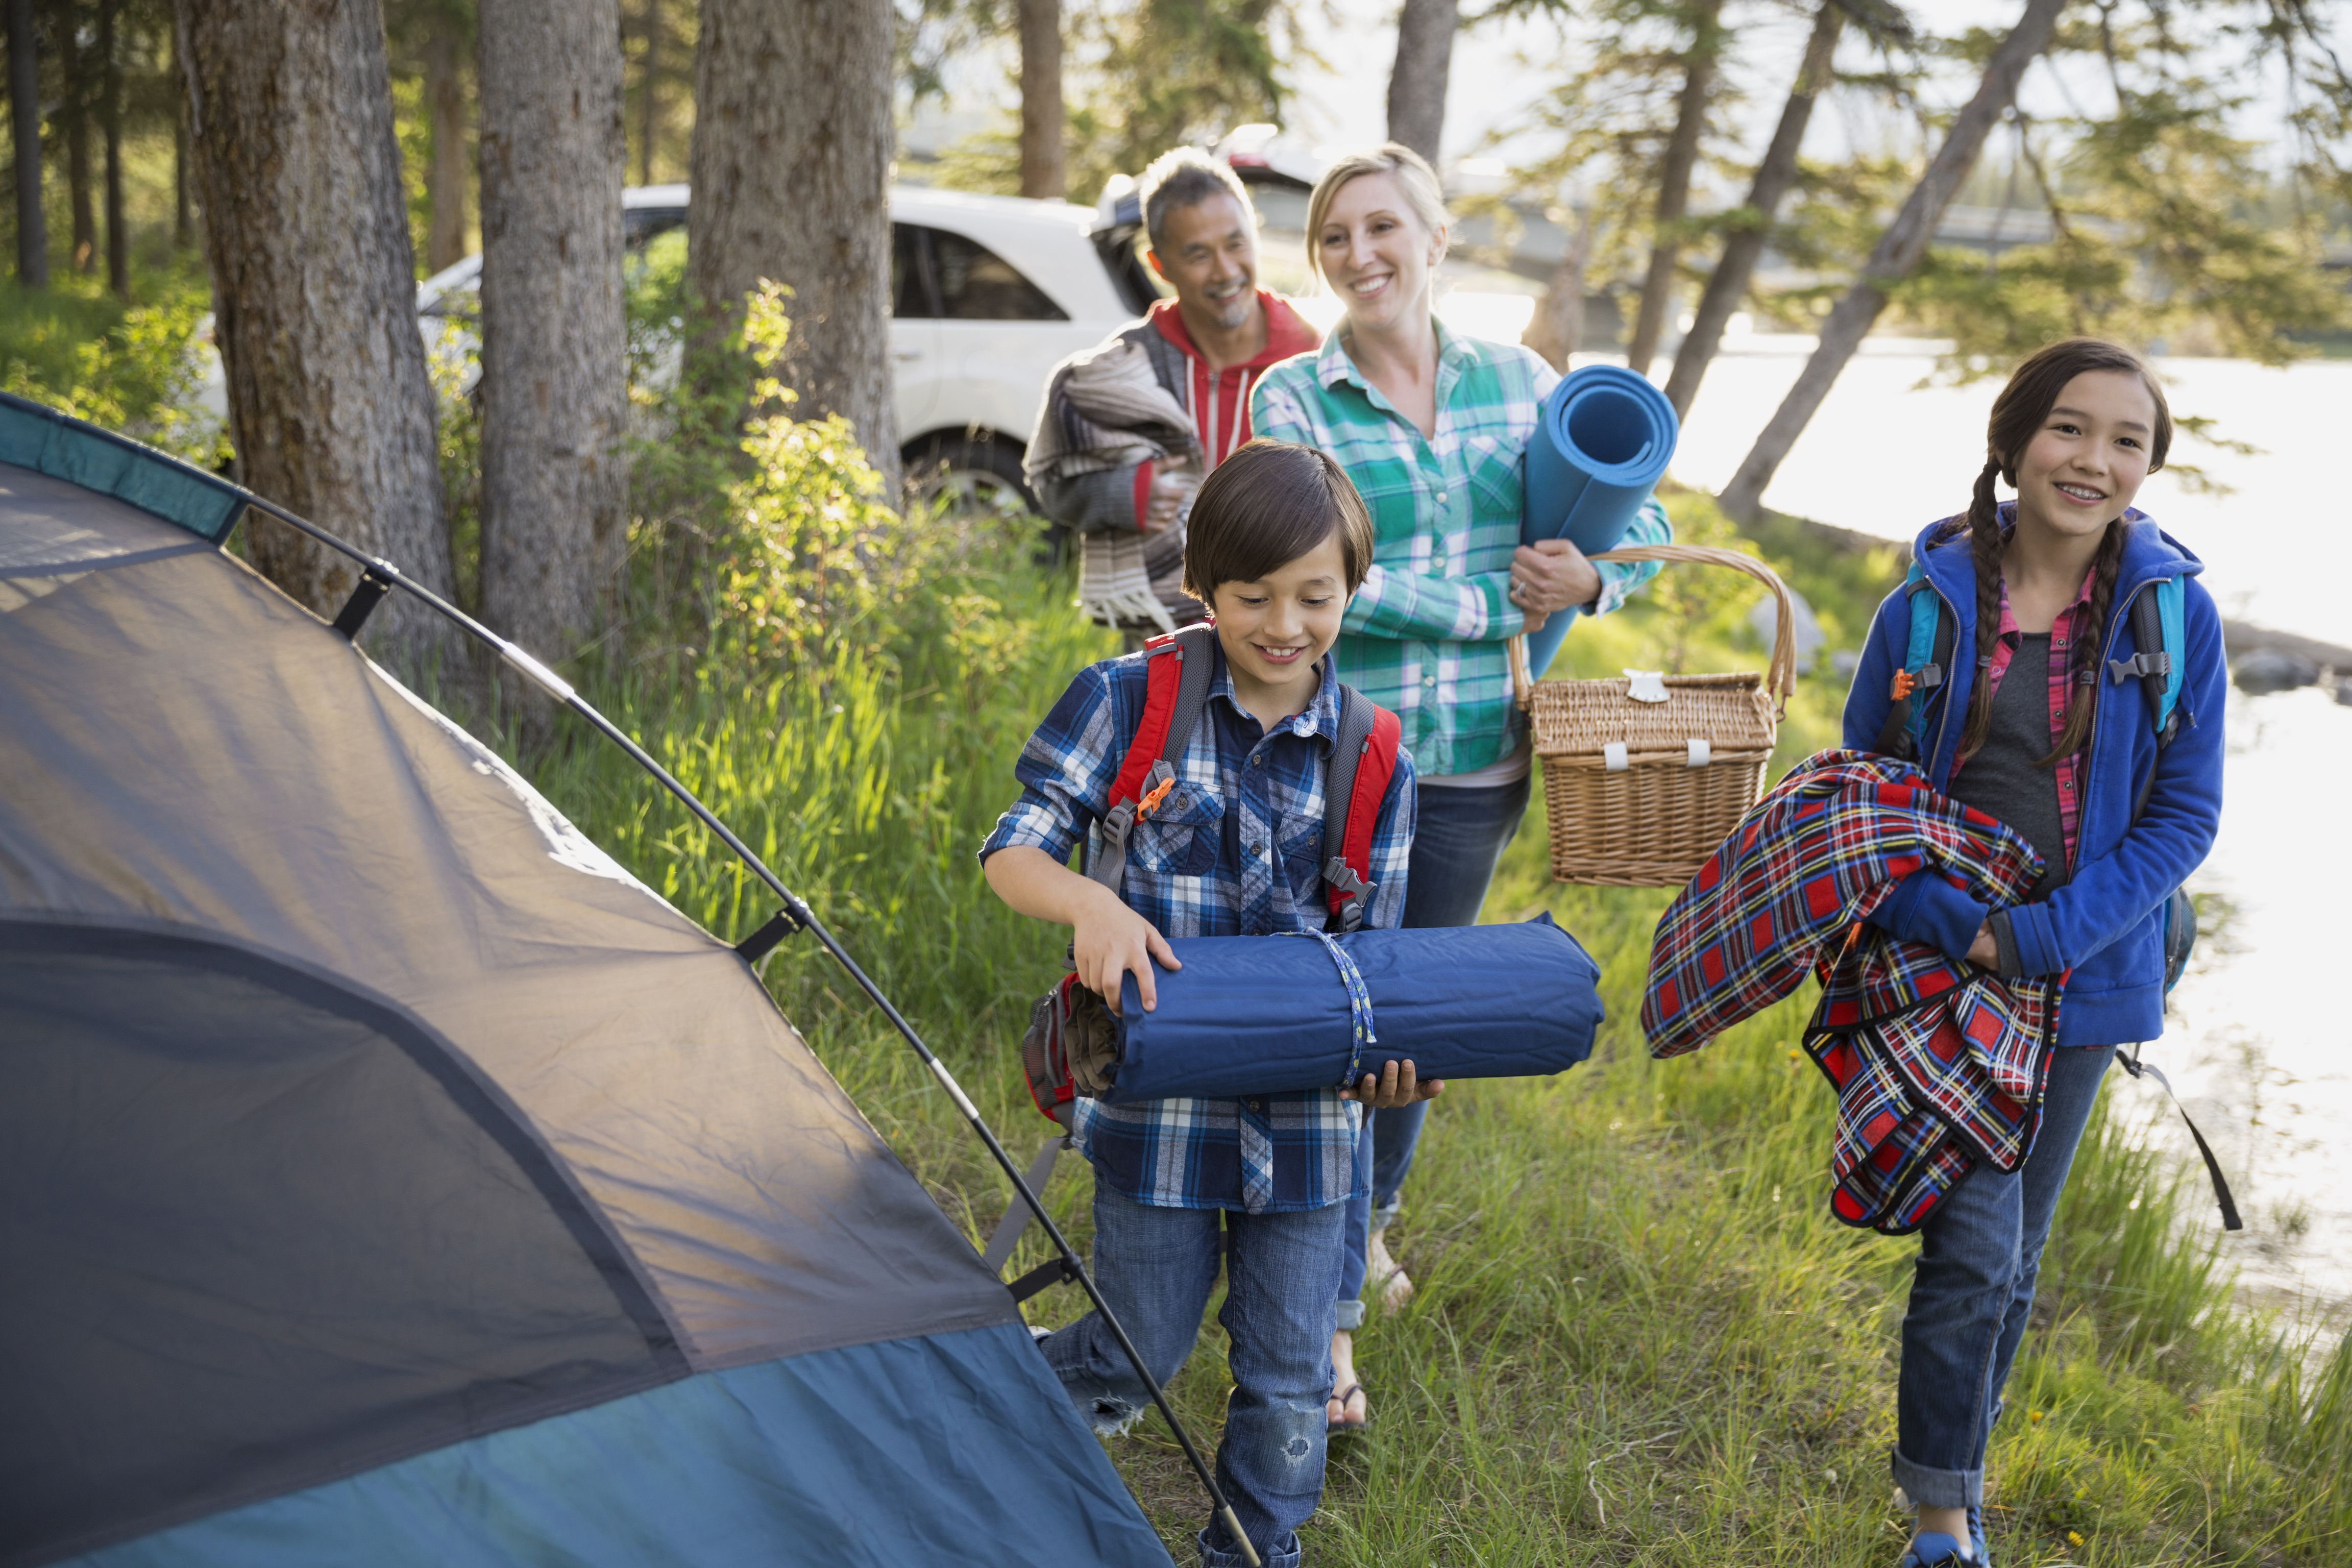 Family-Camping-572133413df78c5640da472b